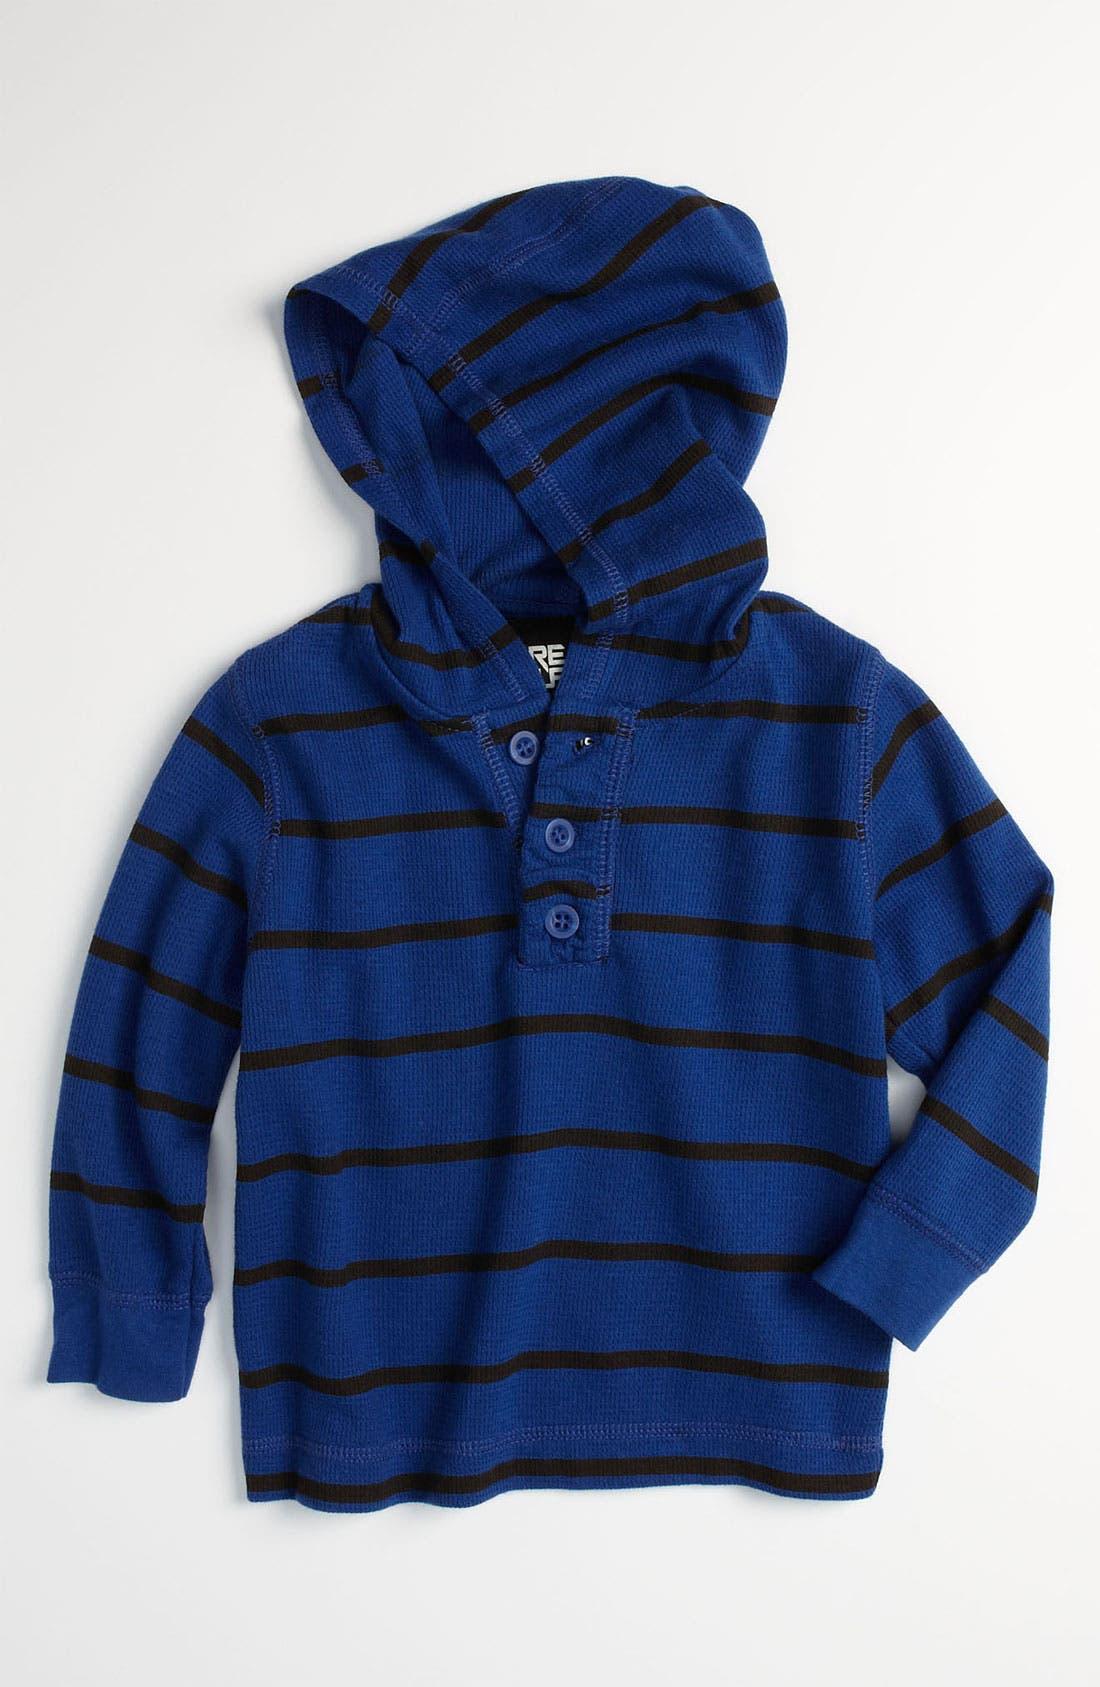 Alternate Image 1 Selected - Pure Stuff 'Tristen' Thermal Hoodie (Toddler)